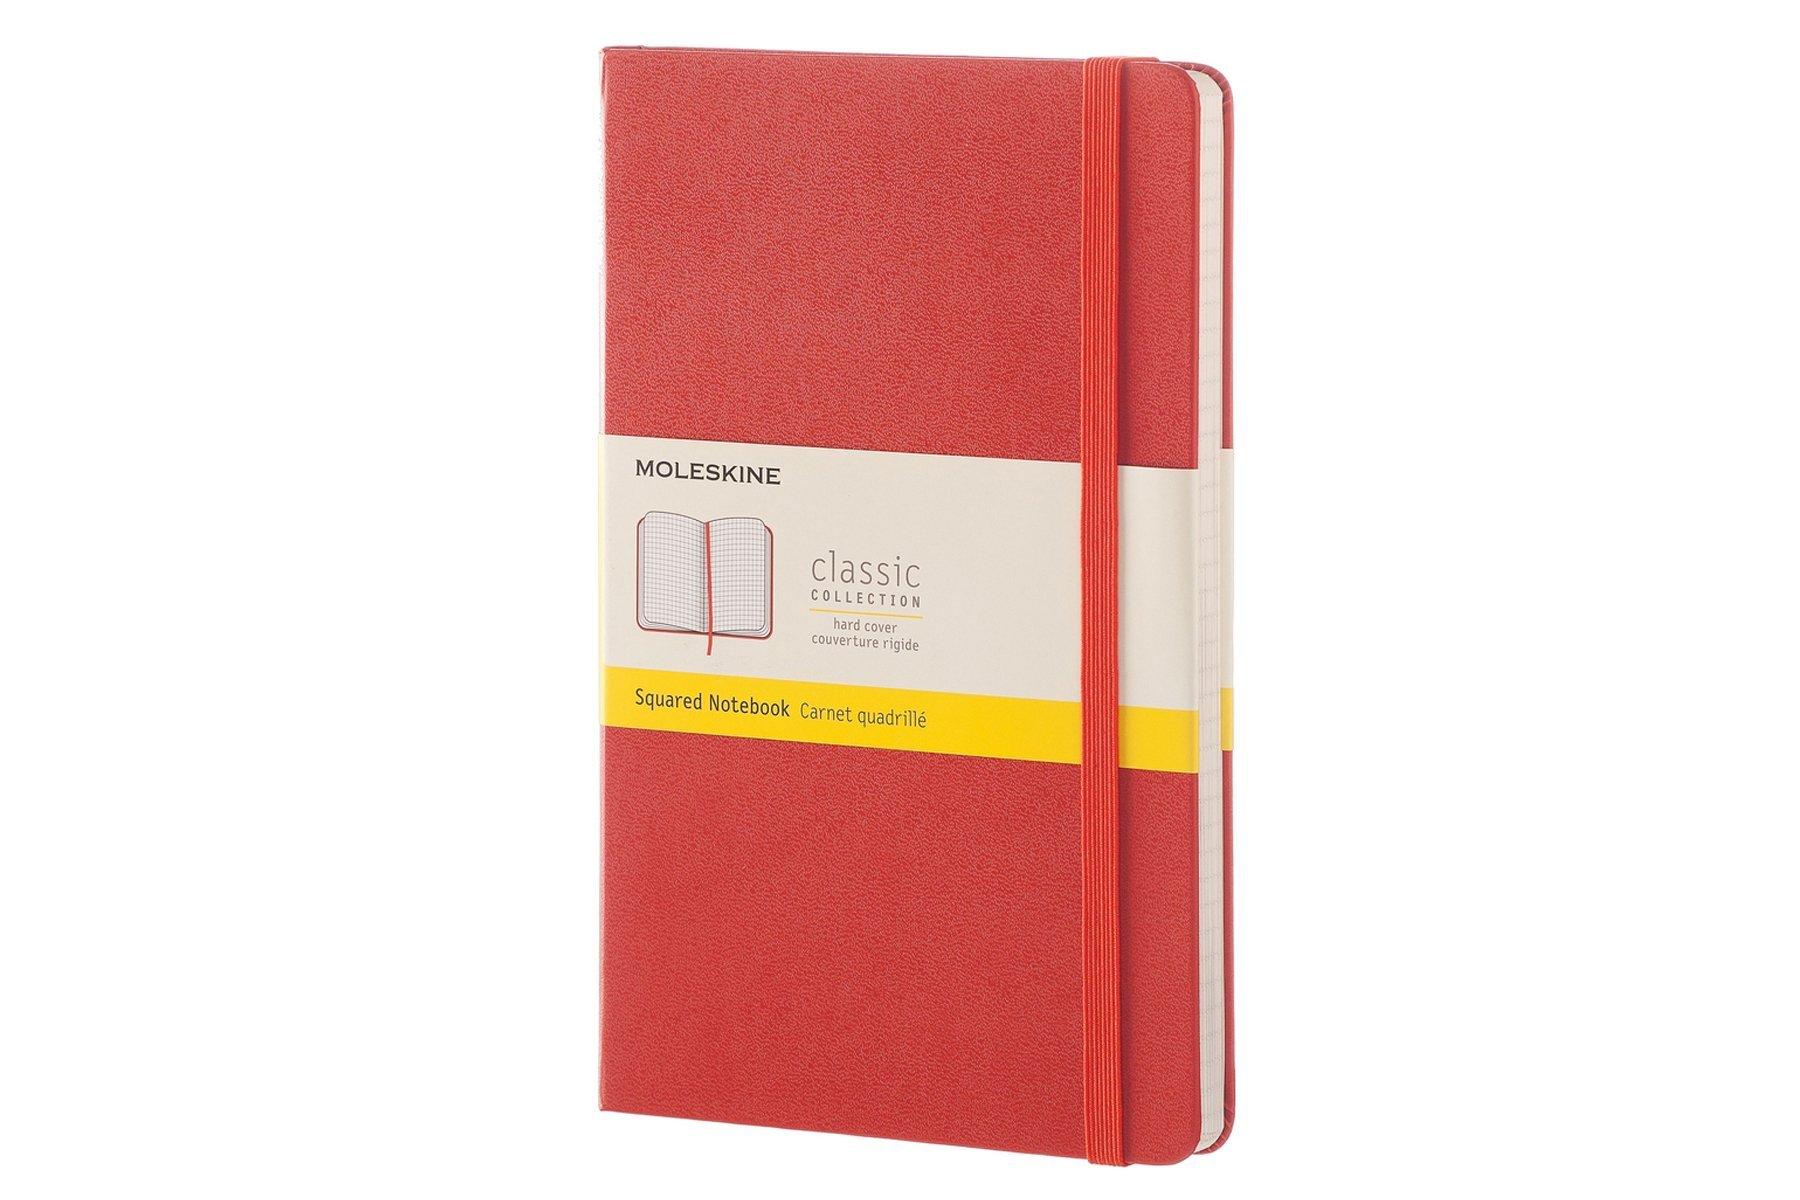 Moleskine Classic Notebook, Large, Squared, Coral Orange, Hard Cover (5 x  8.25): Moleskine: 8051272893779: Amazon.com: Books